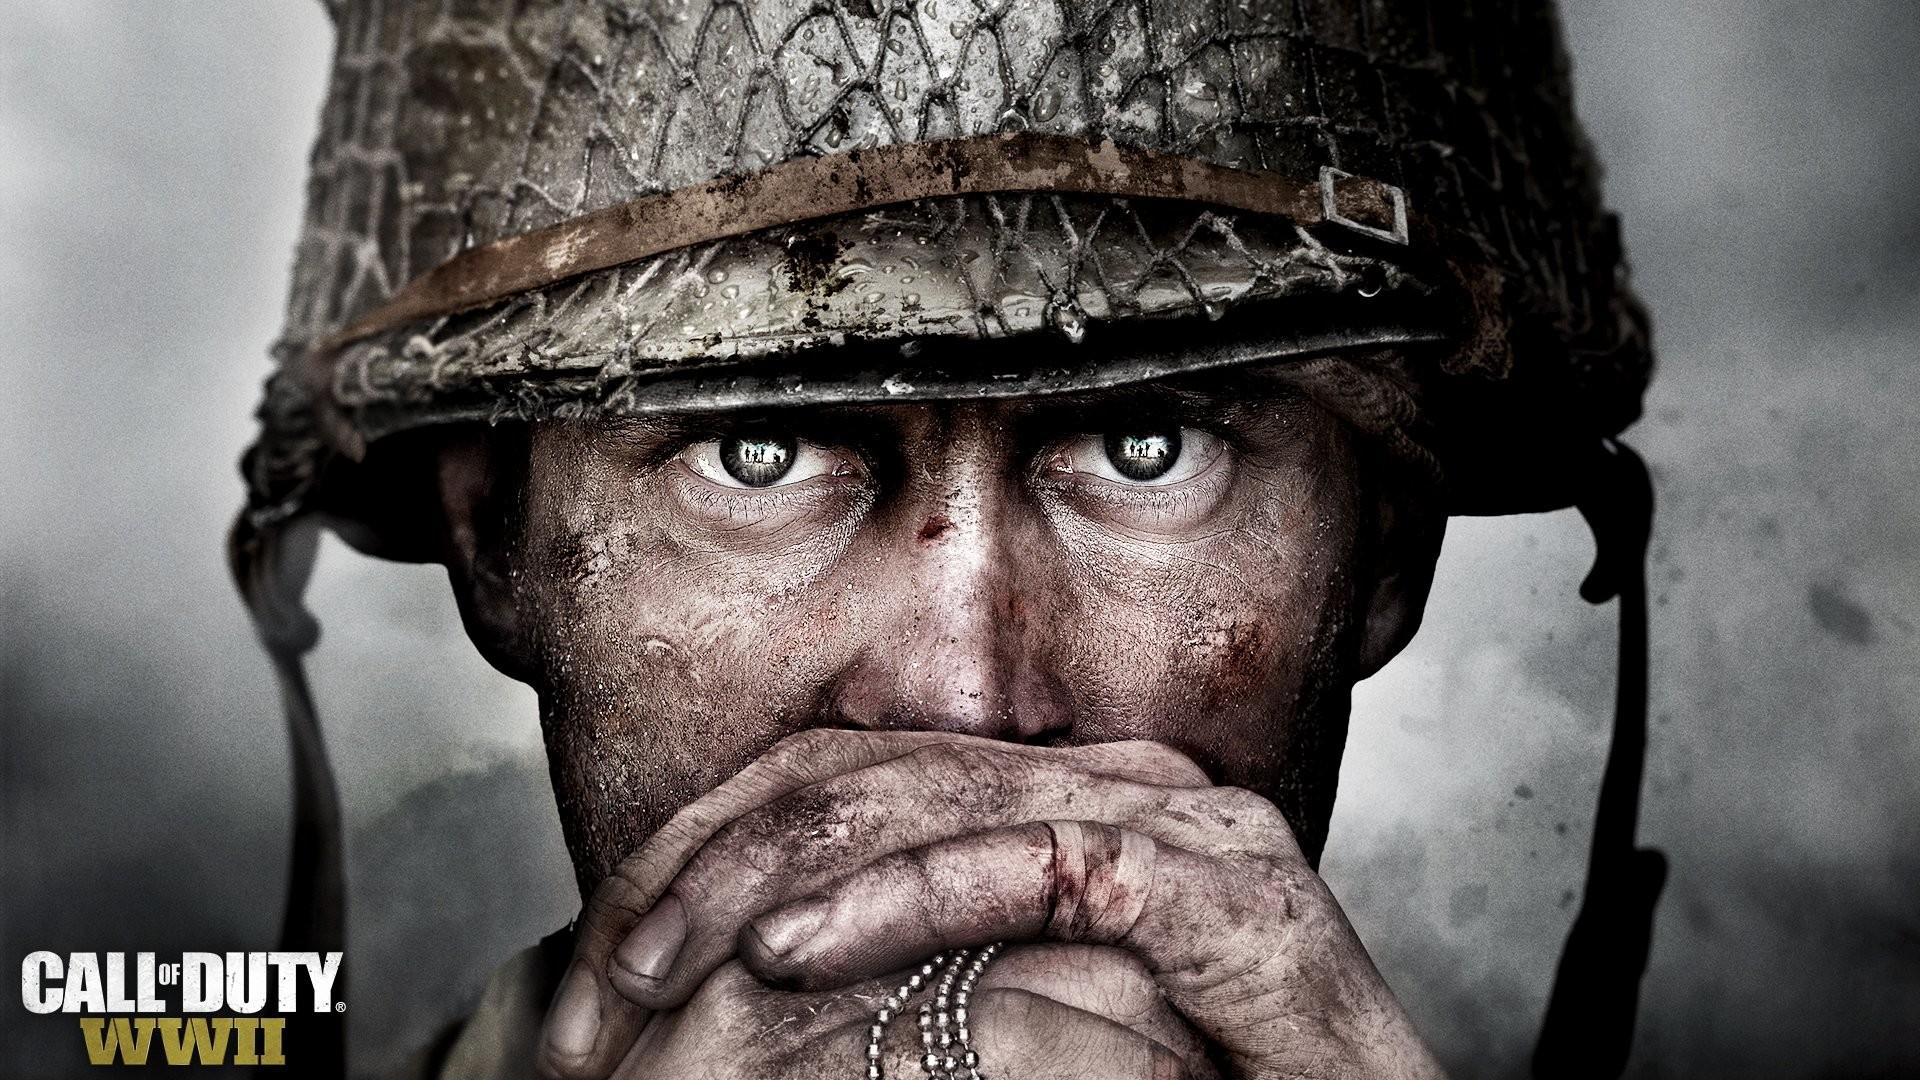 Call of Duty WW2 Wallpaper 1920×1080